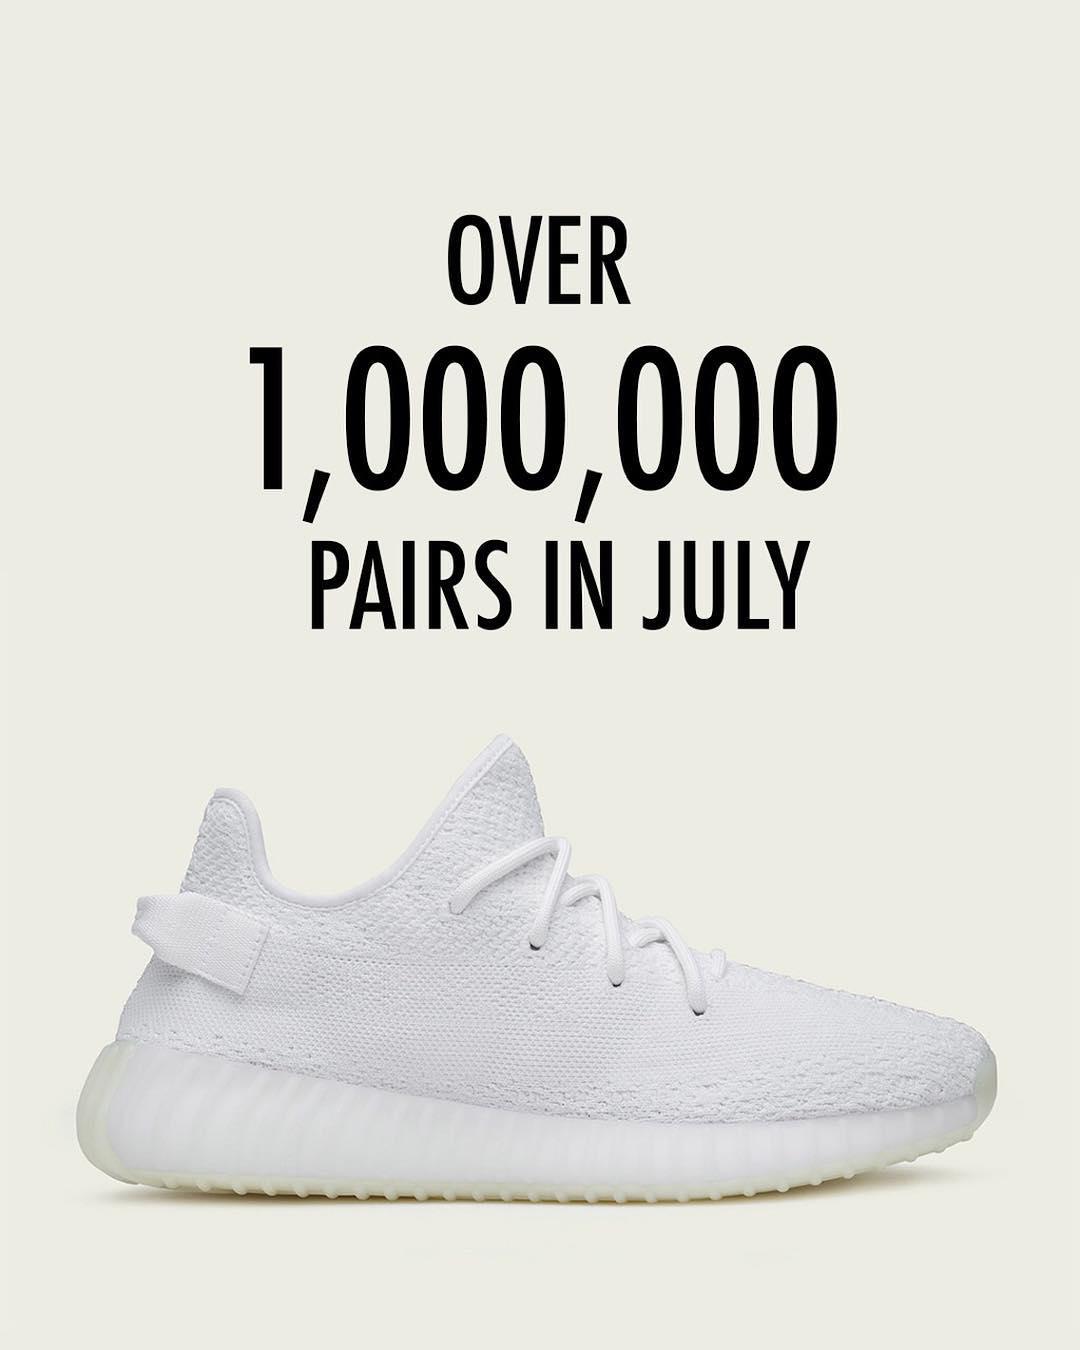 adidas,Yeezy 350 V2,发售  最新消息!纯白 Yeezy 350 V2今晚凌晨官网发售!入手链接在此!